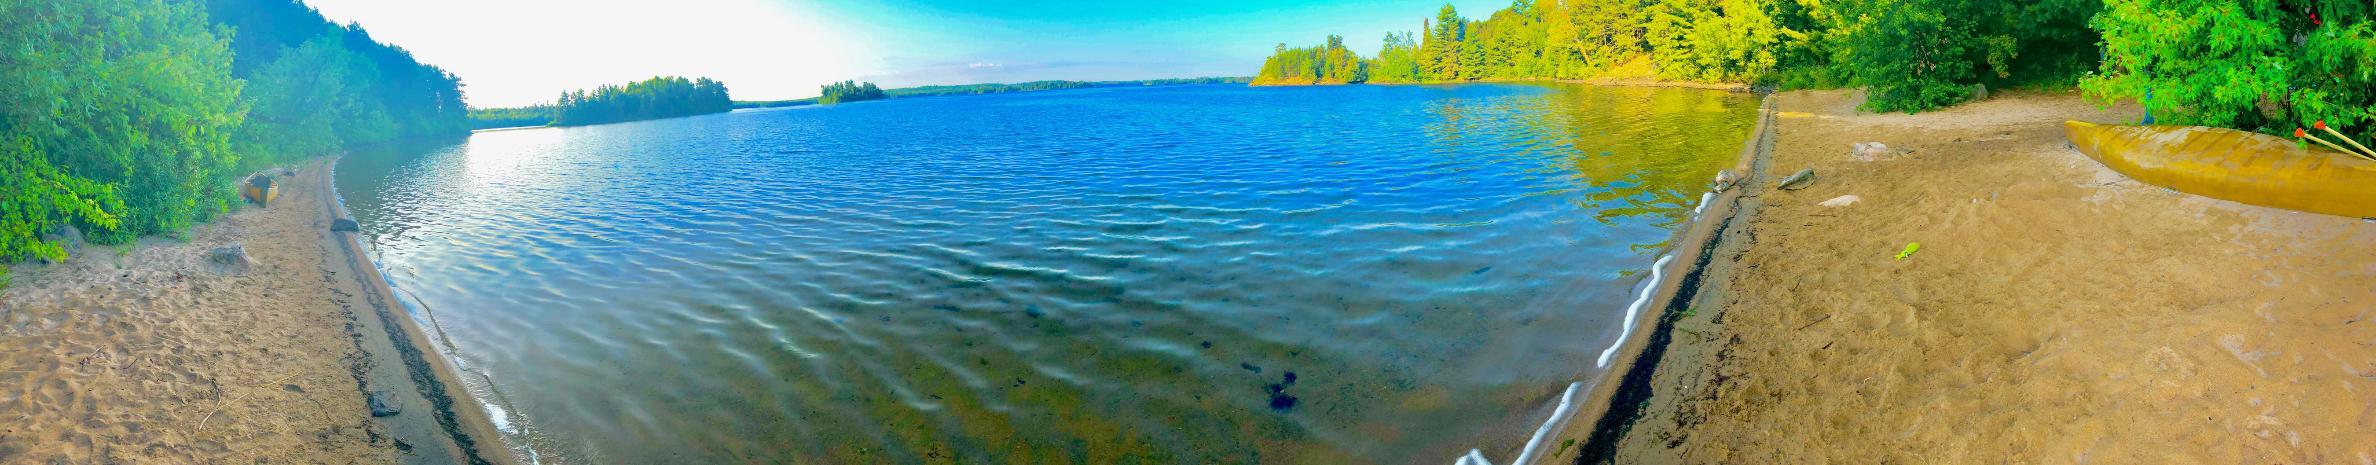 Washington Island Beach Site